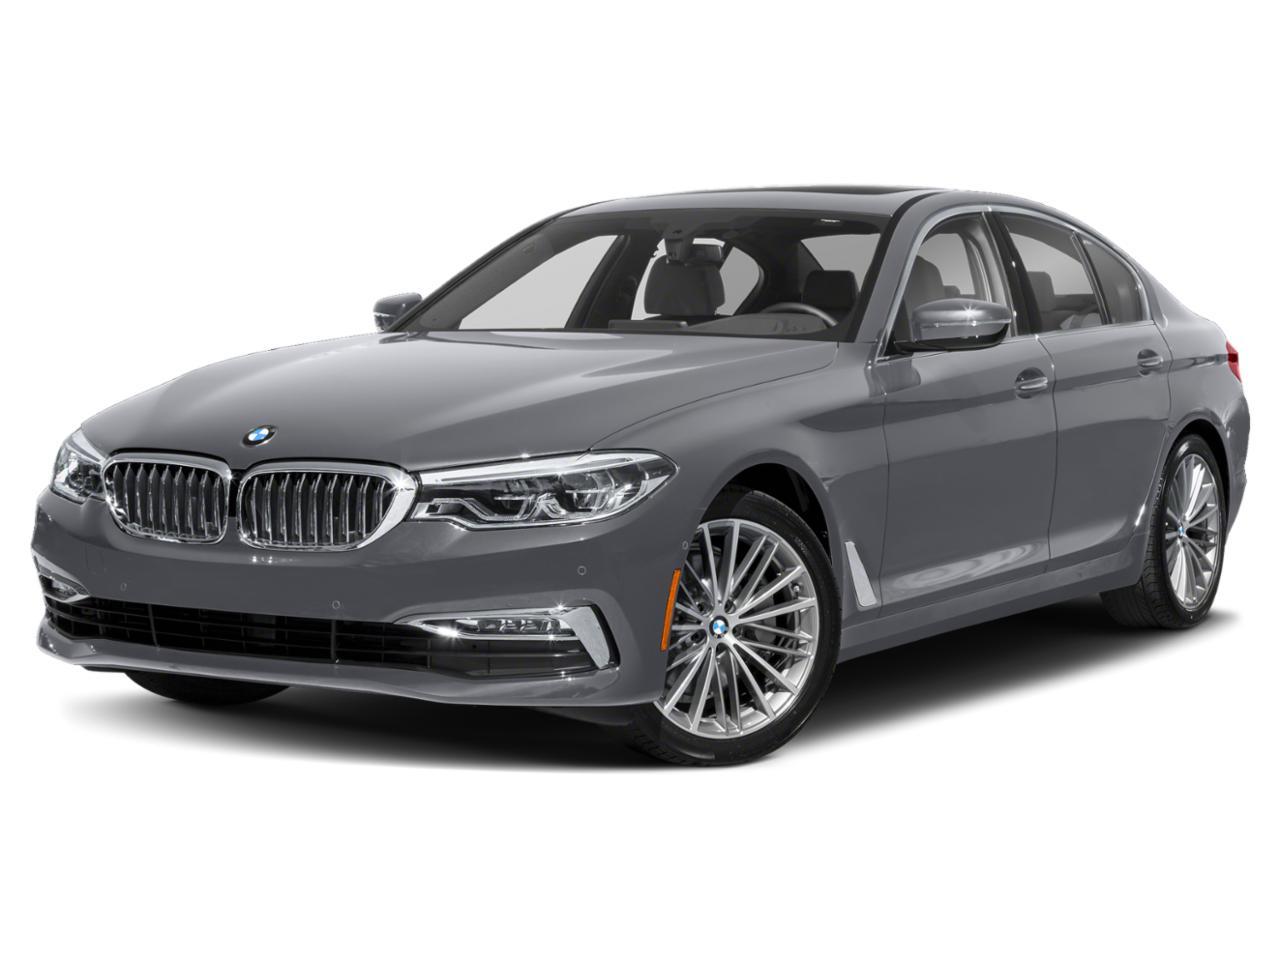 2020 BMW 540i Vehicle Photo in Grapevine, TX 76051